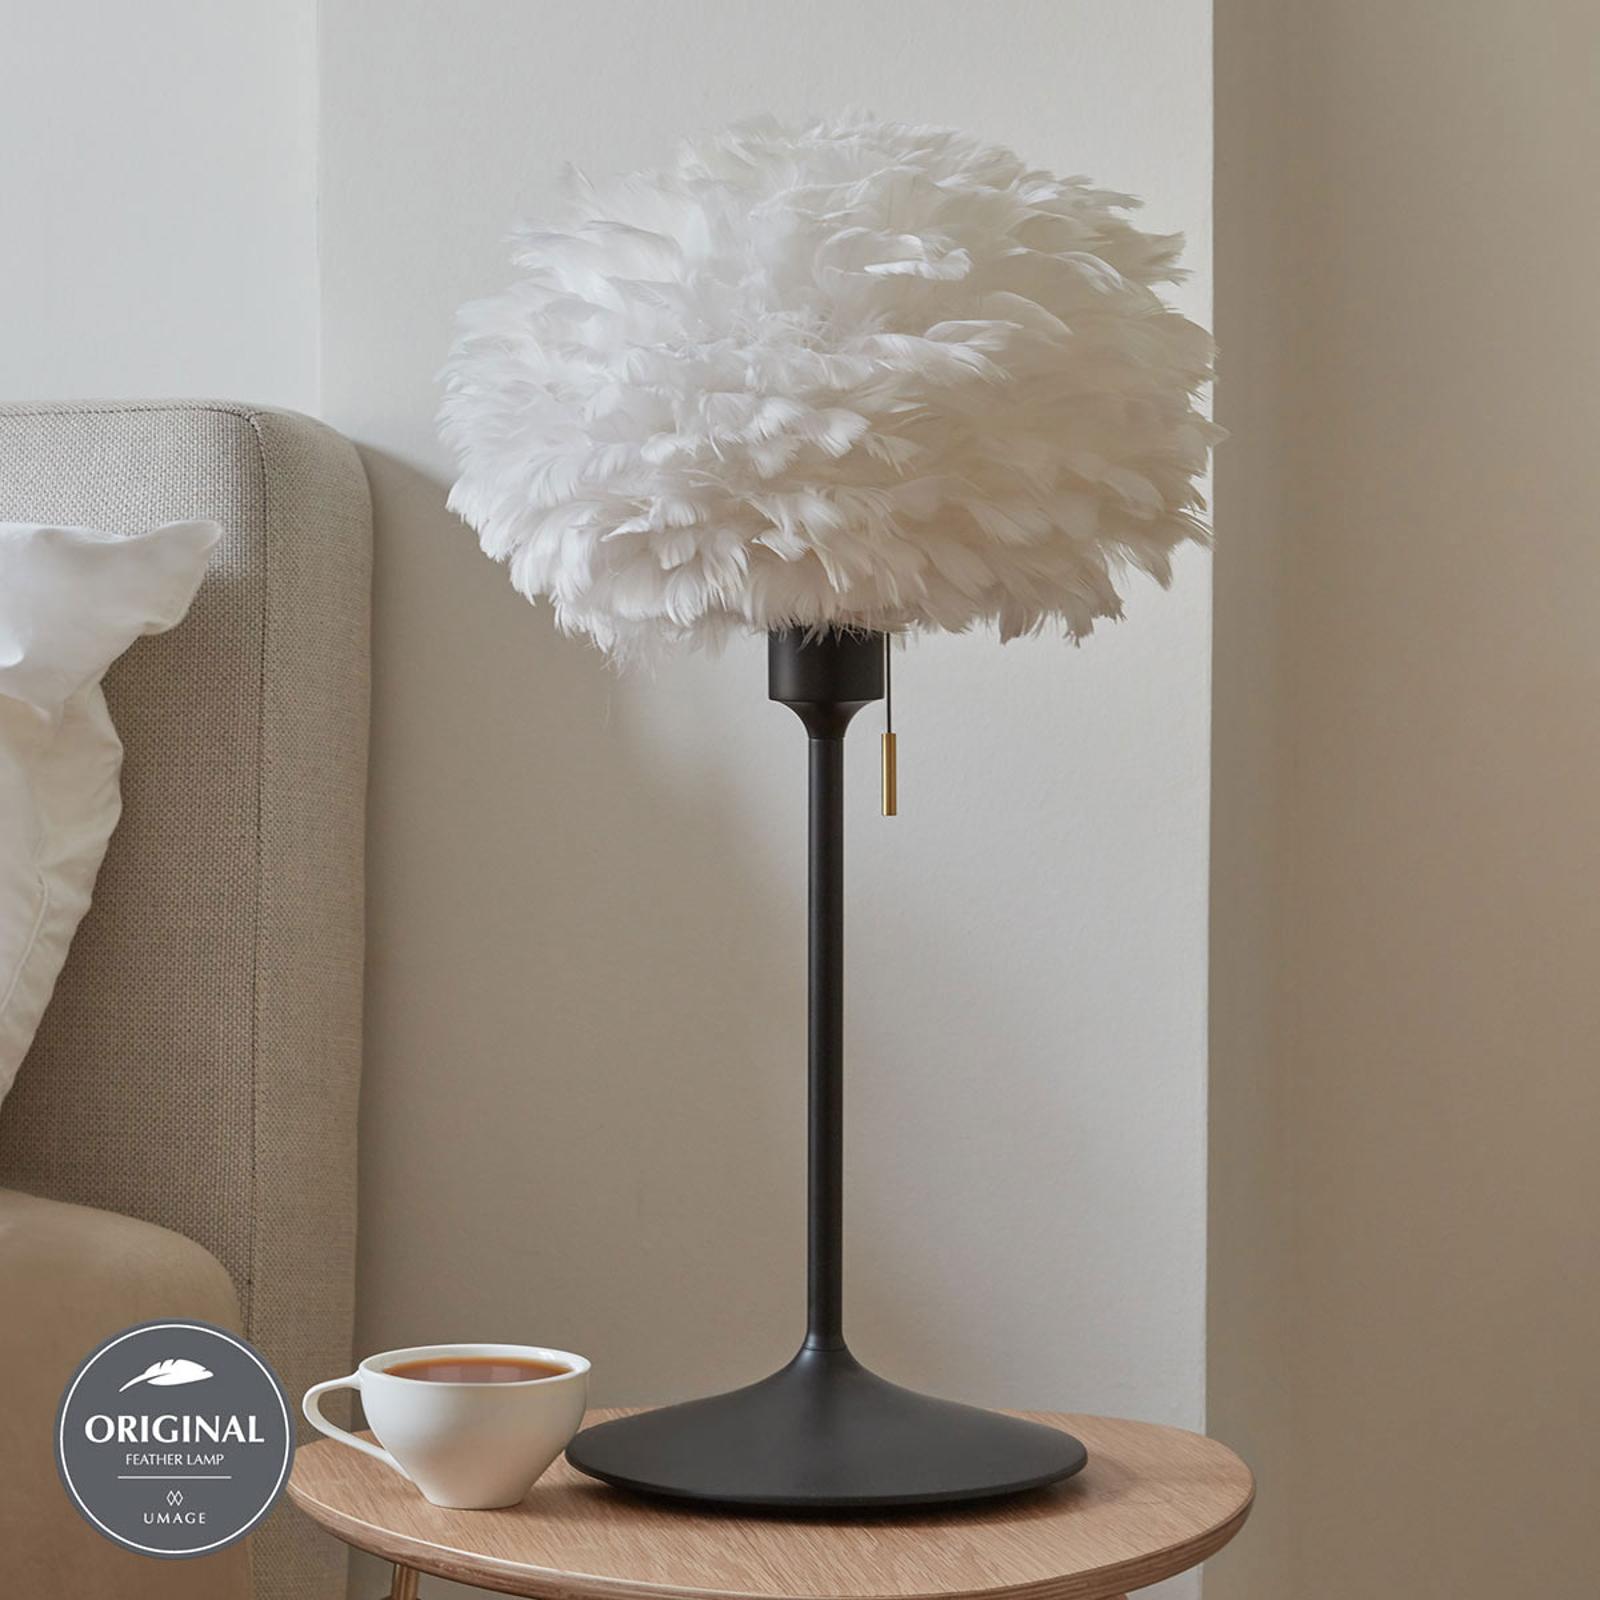 UMAGE Eos mini bordslampa vit Champagne svart